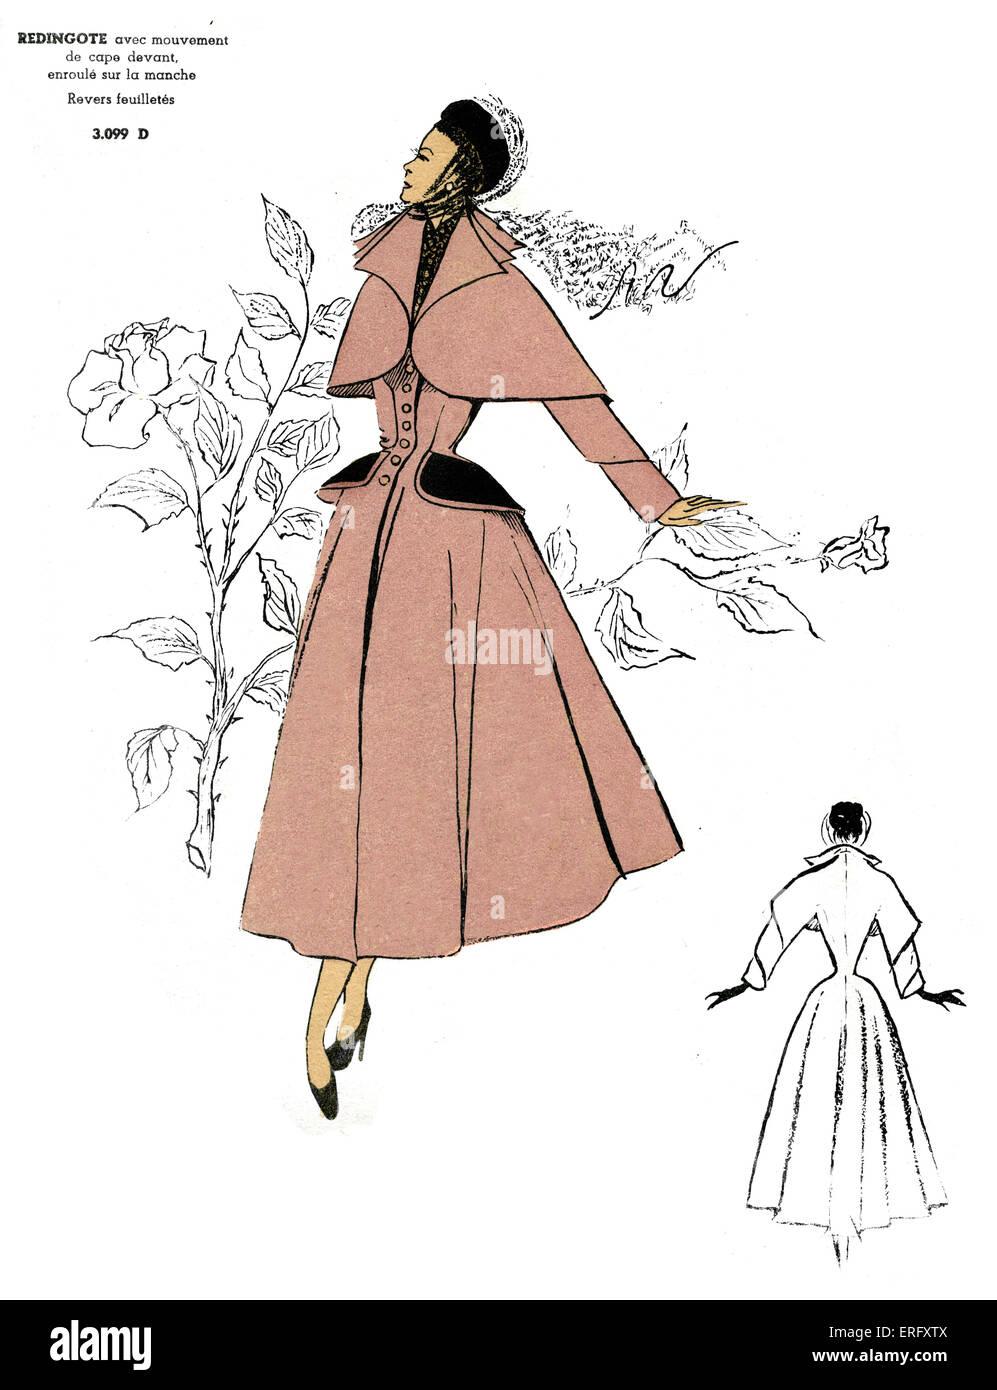 French fashion, Redingote coat design with prominent loose-fitting cape/ Redingote avec mouvement de cape. For the - Stock Image